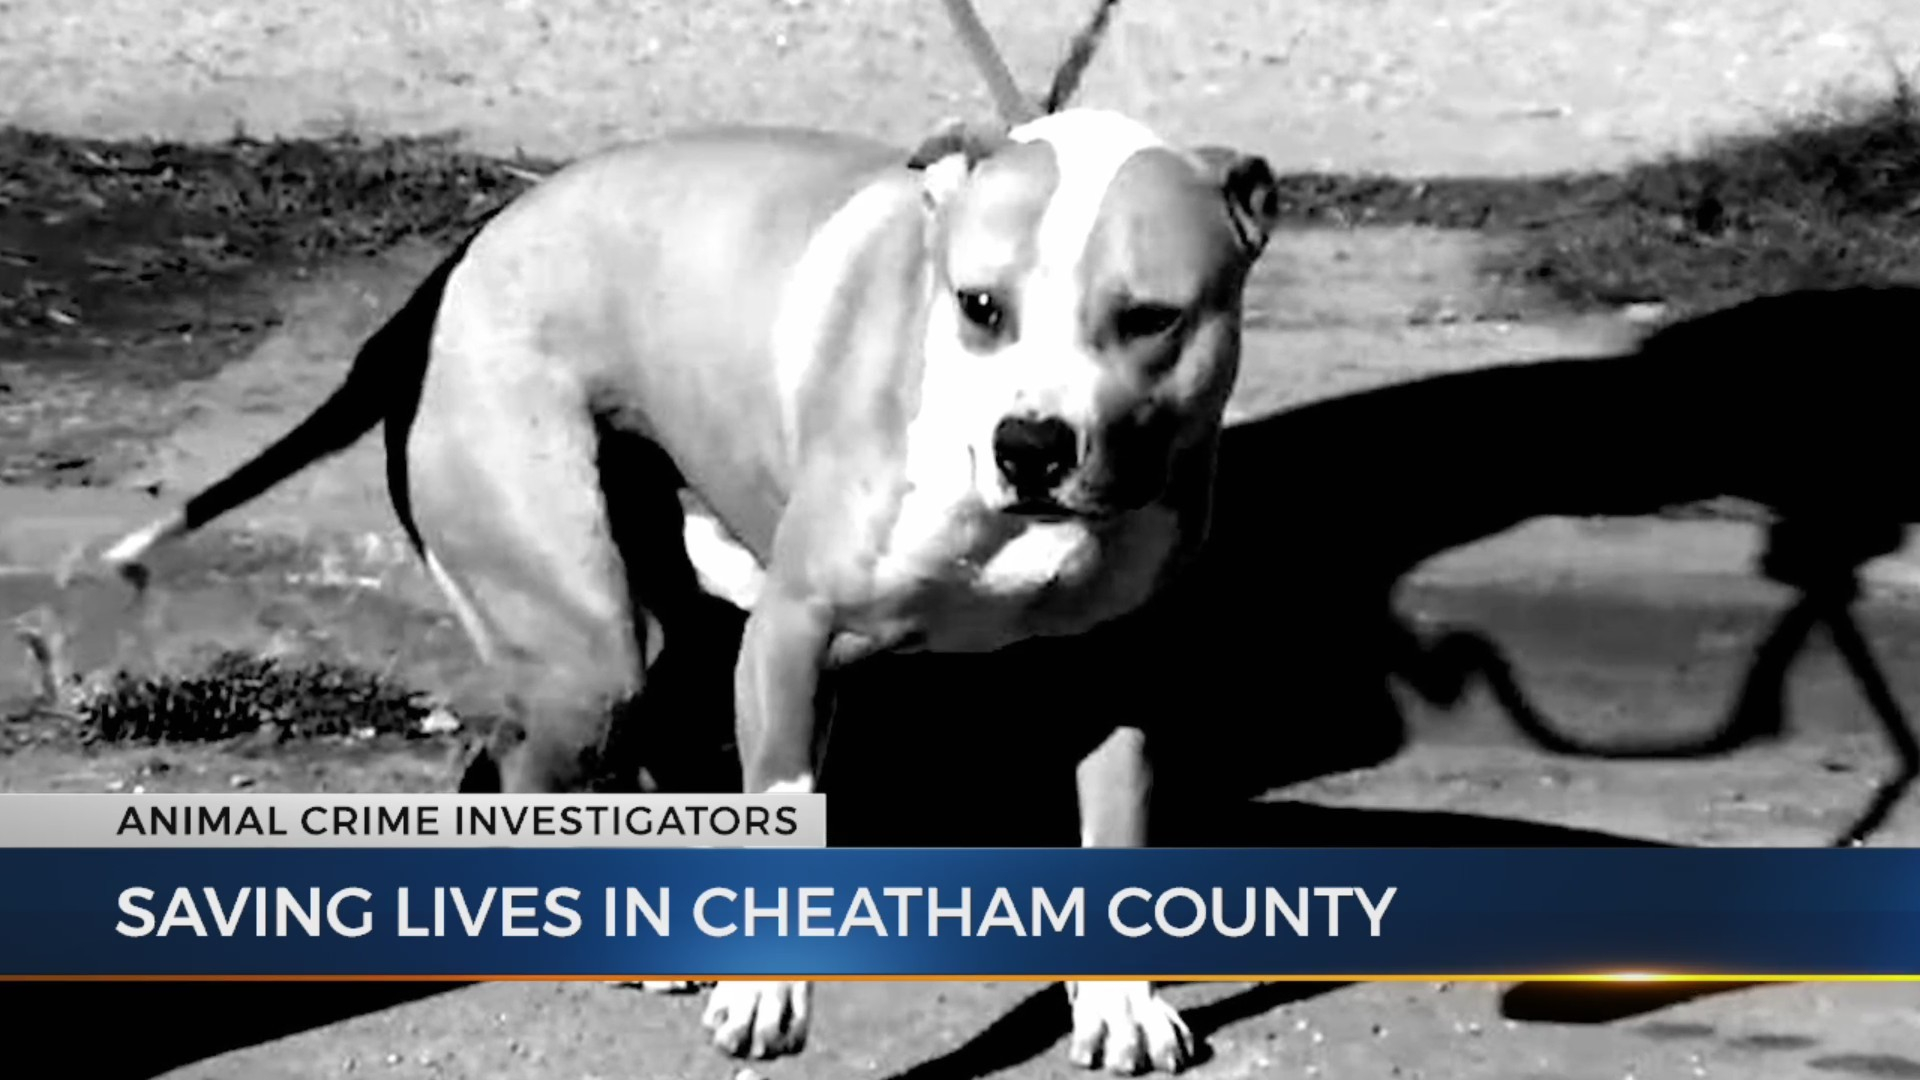 Shelter_saves_lives_across_Cheatham_Coun_0_20181011214148